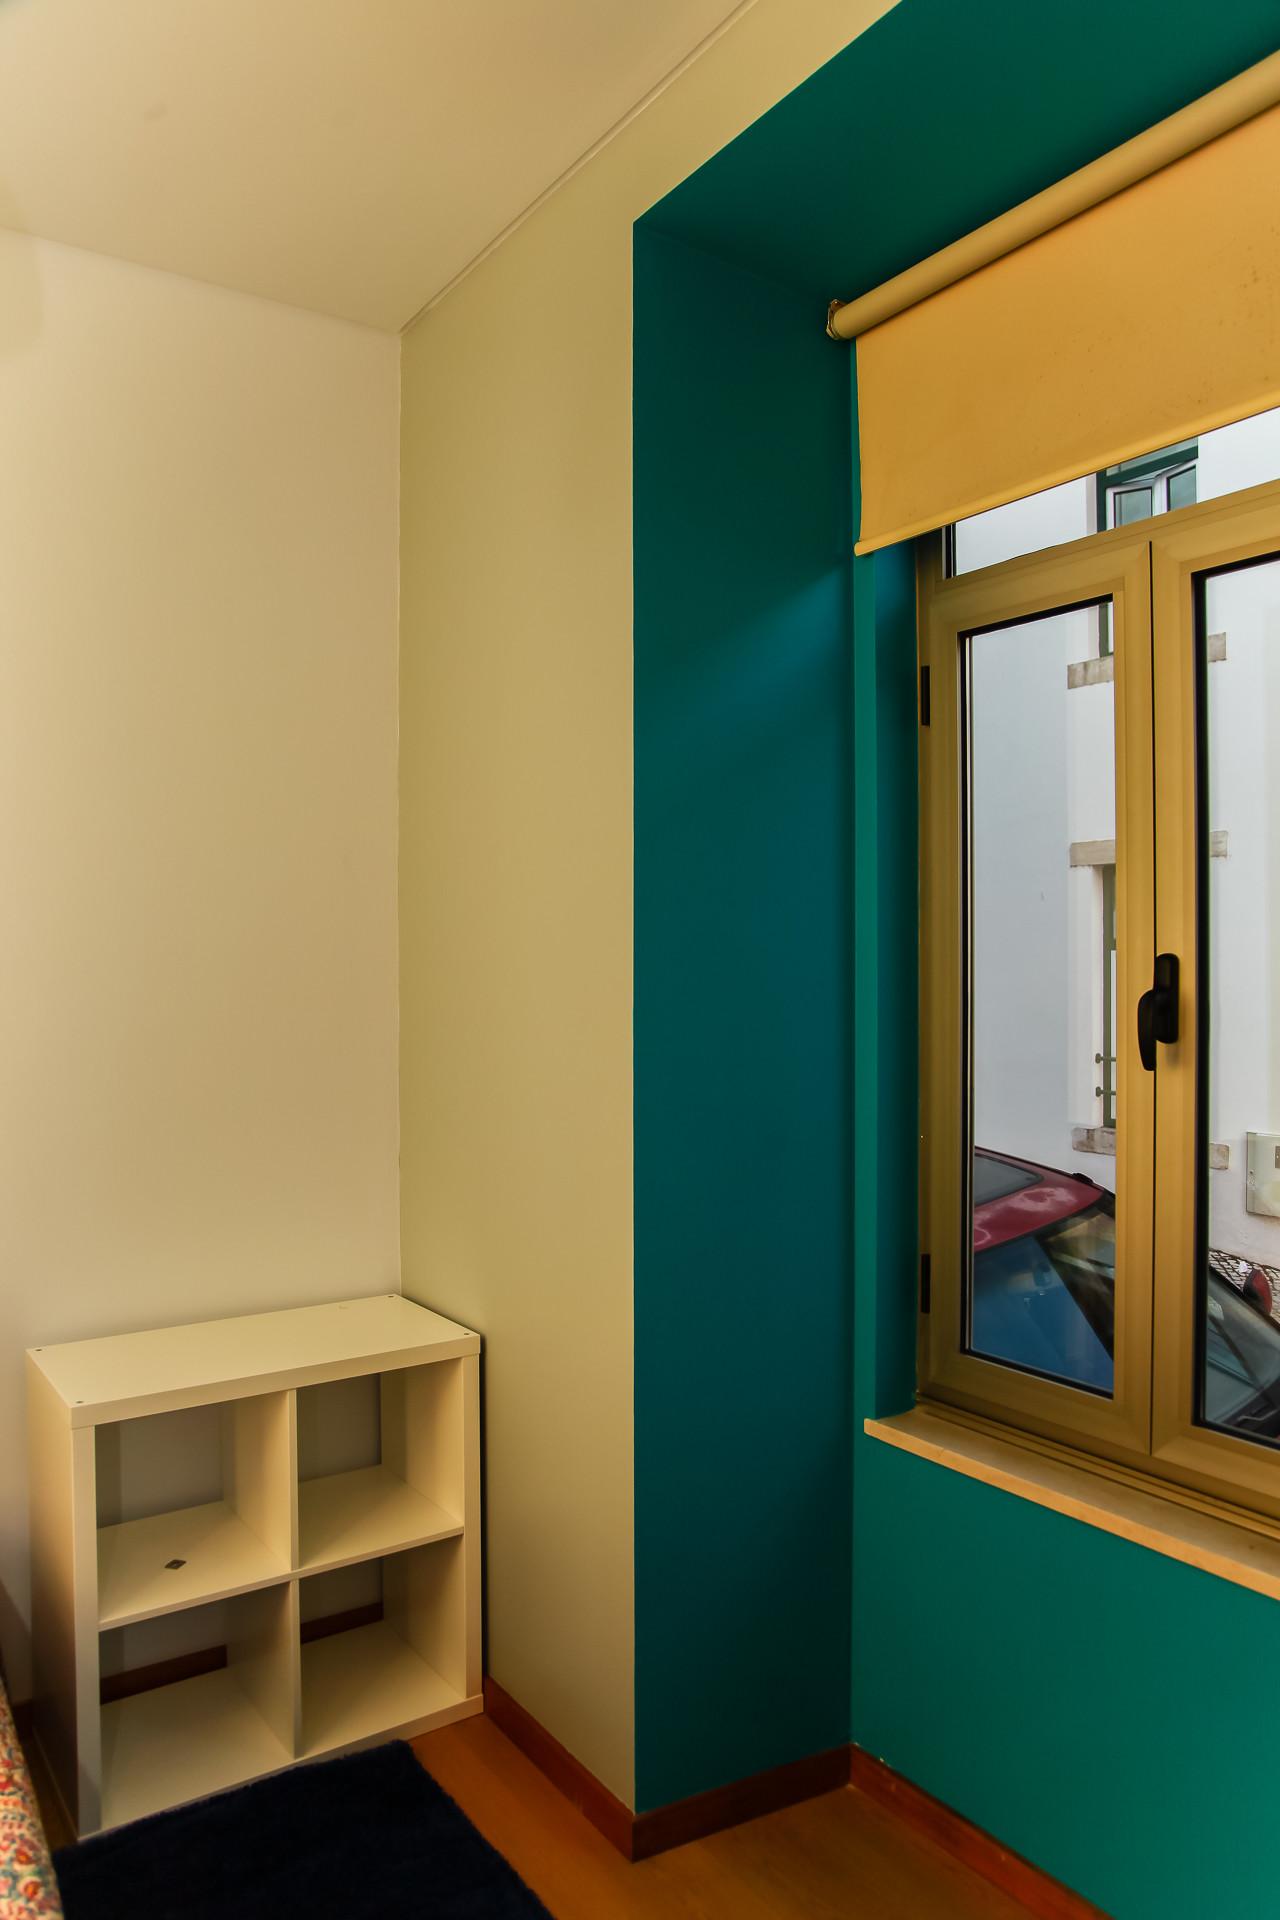 quartos para alugar coimbra viptransex net